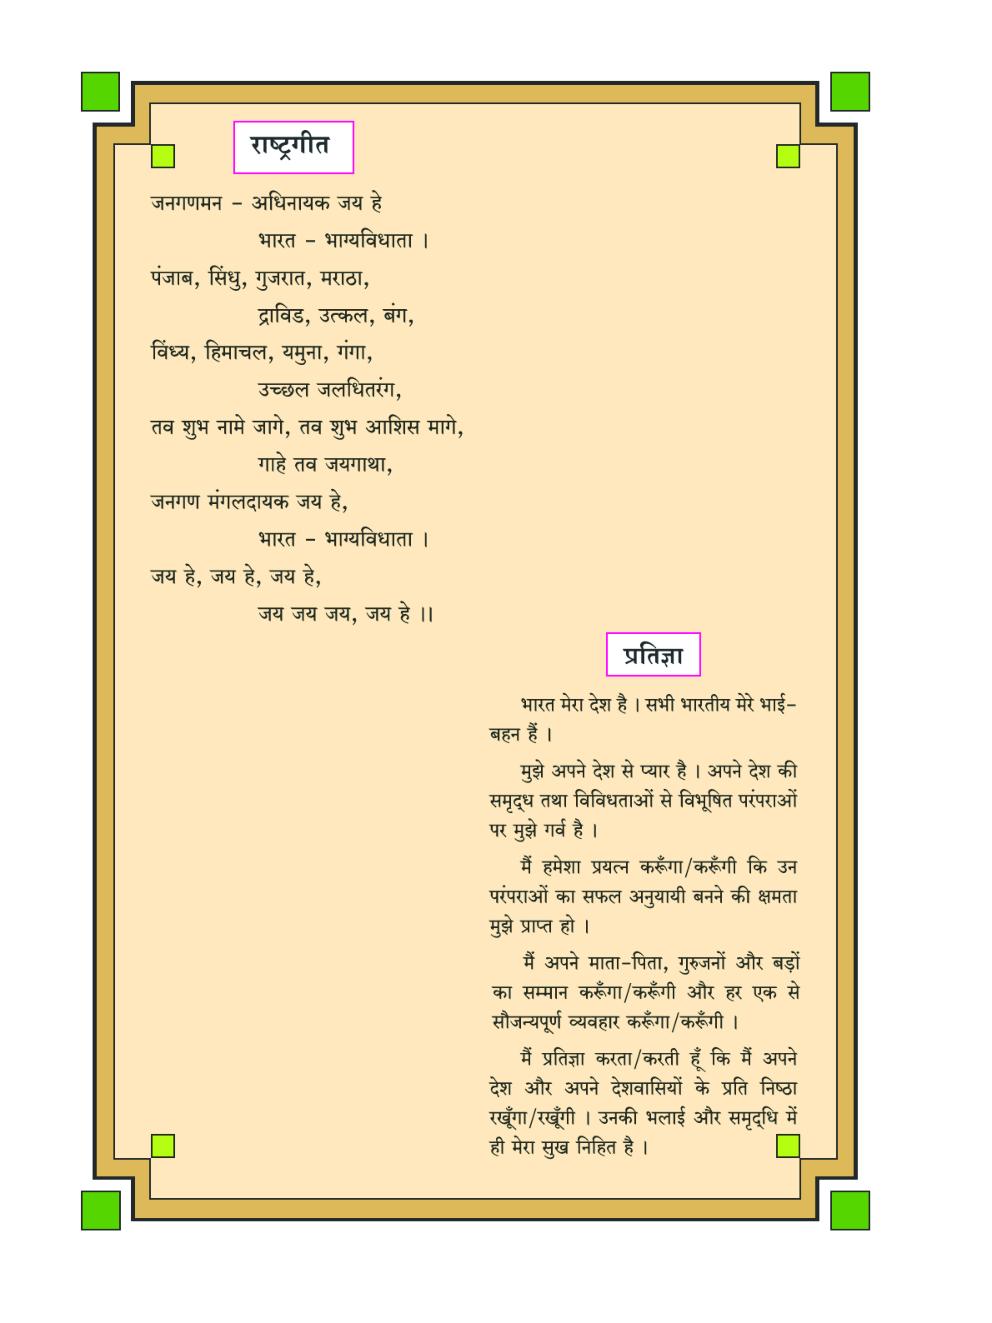 Maharashtra School Textbook परिसर अध्ययन (भाग-१) For Class-5 - Page 5